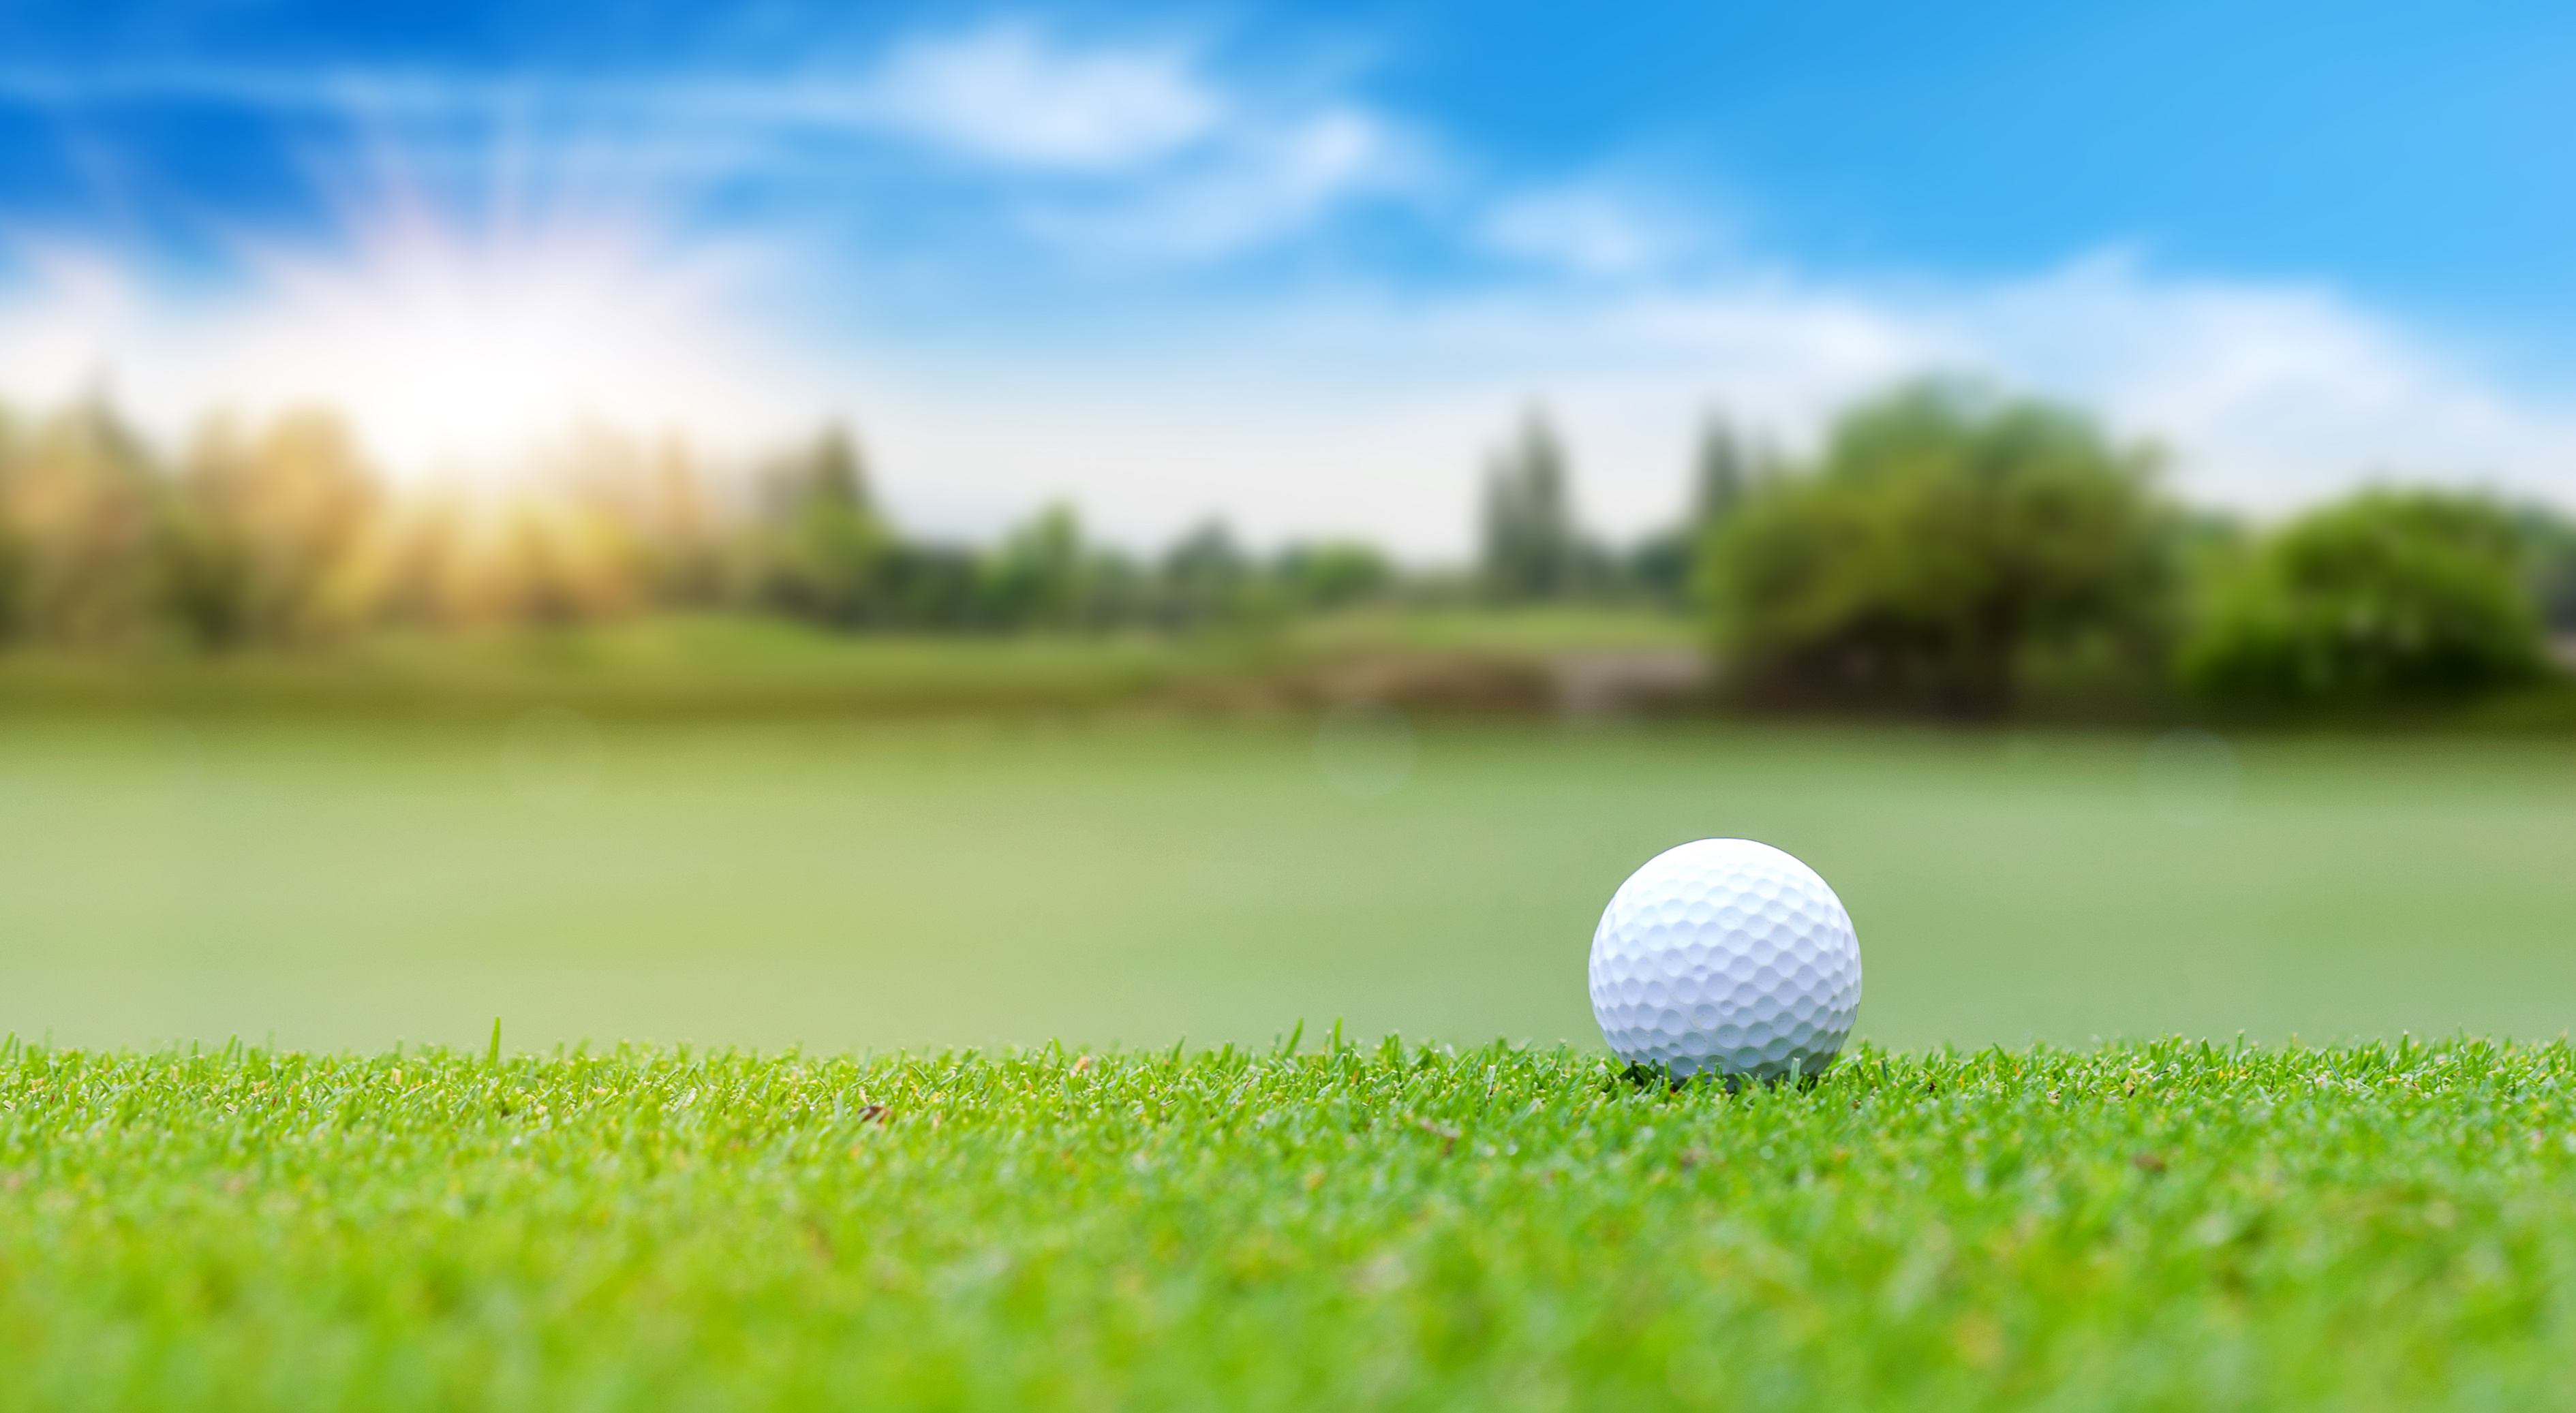 Lane Foundation Schedules Annual Golf Tournament